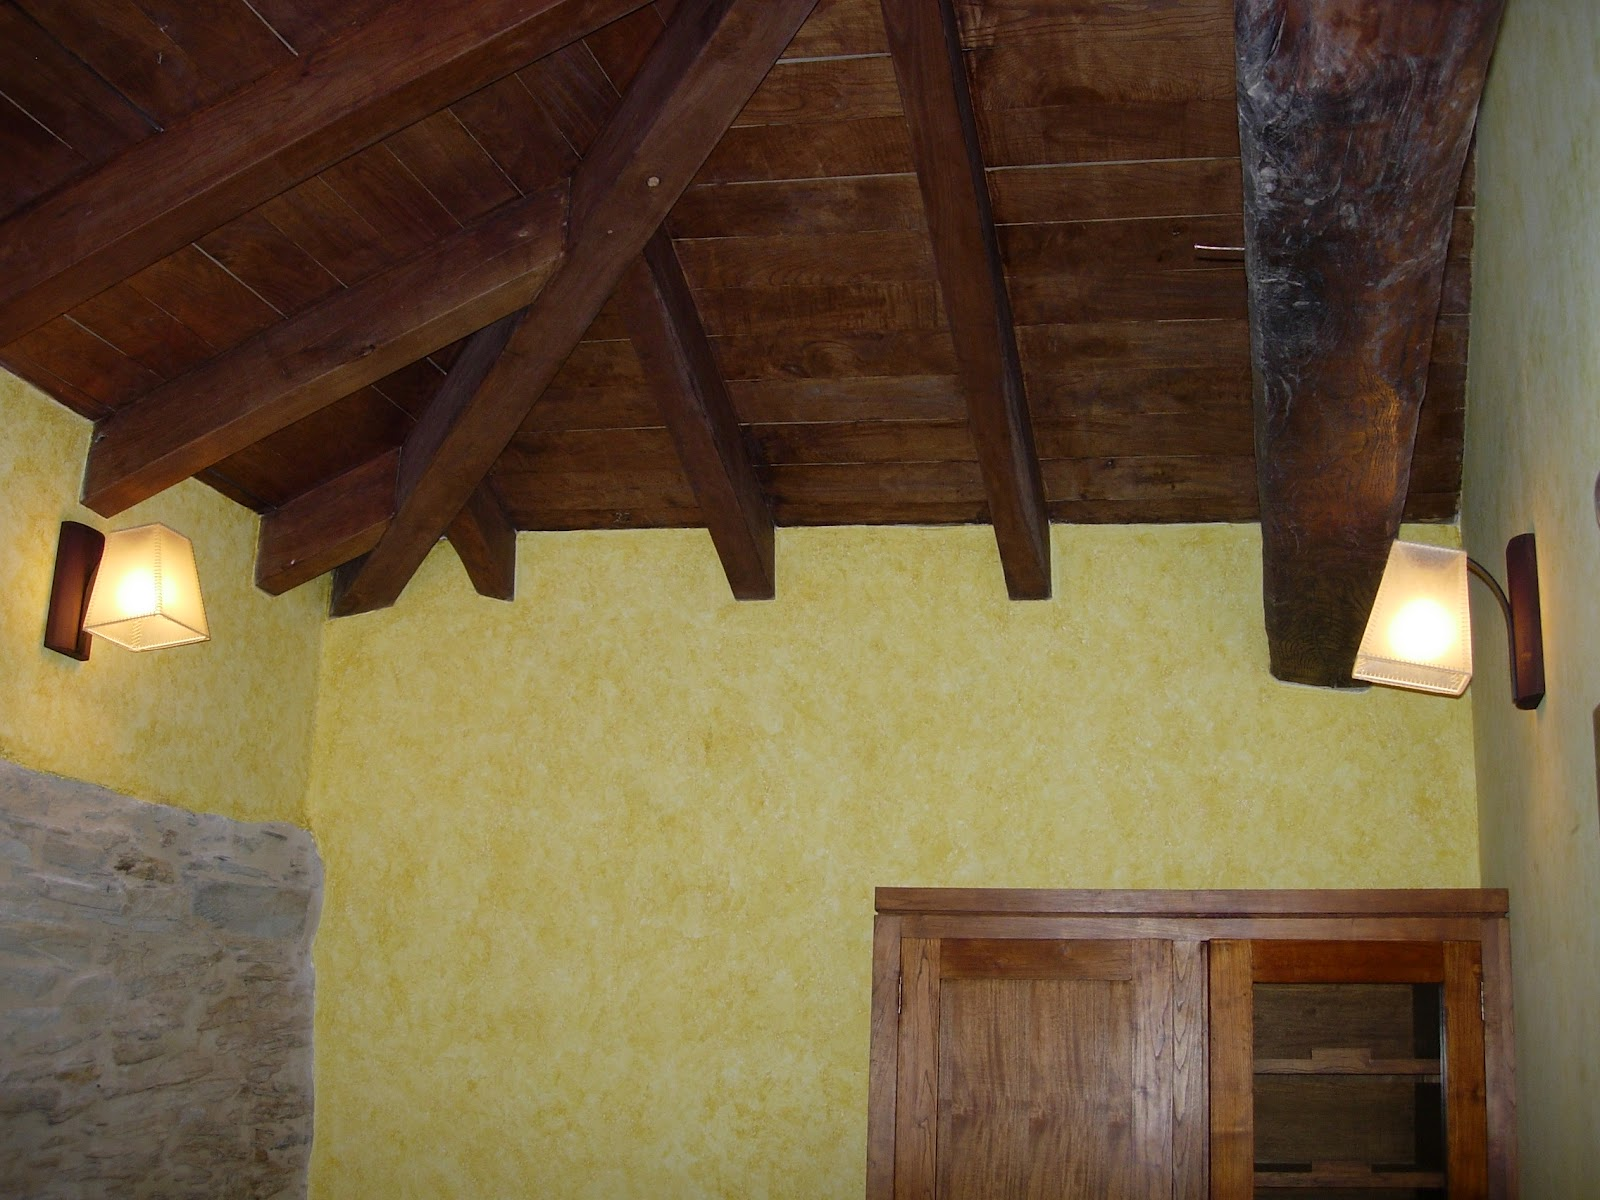 Luminaria apartamentos rurales o plant o - Apliques para techo ...